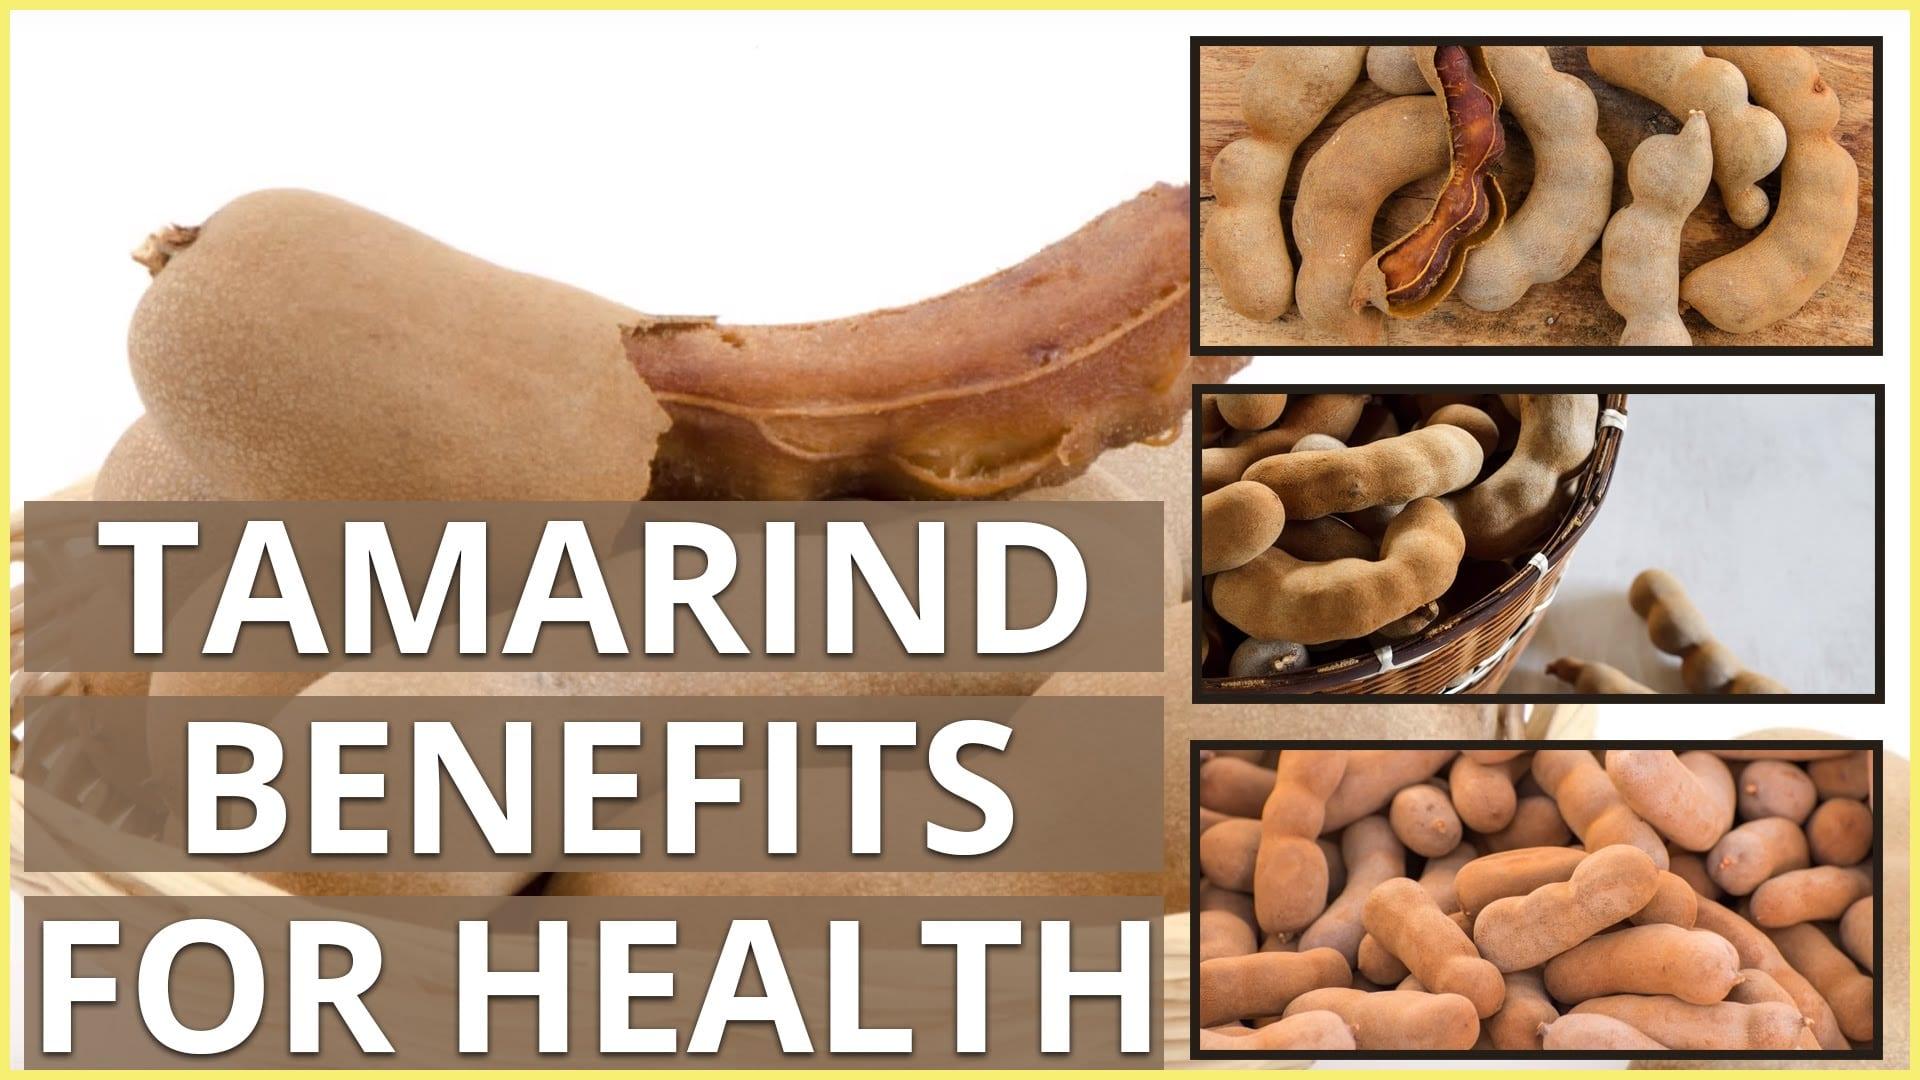 Amazing health benefits of tamarind